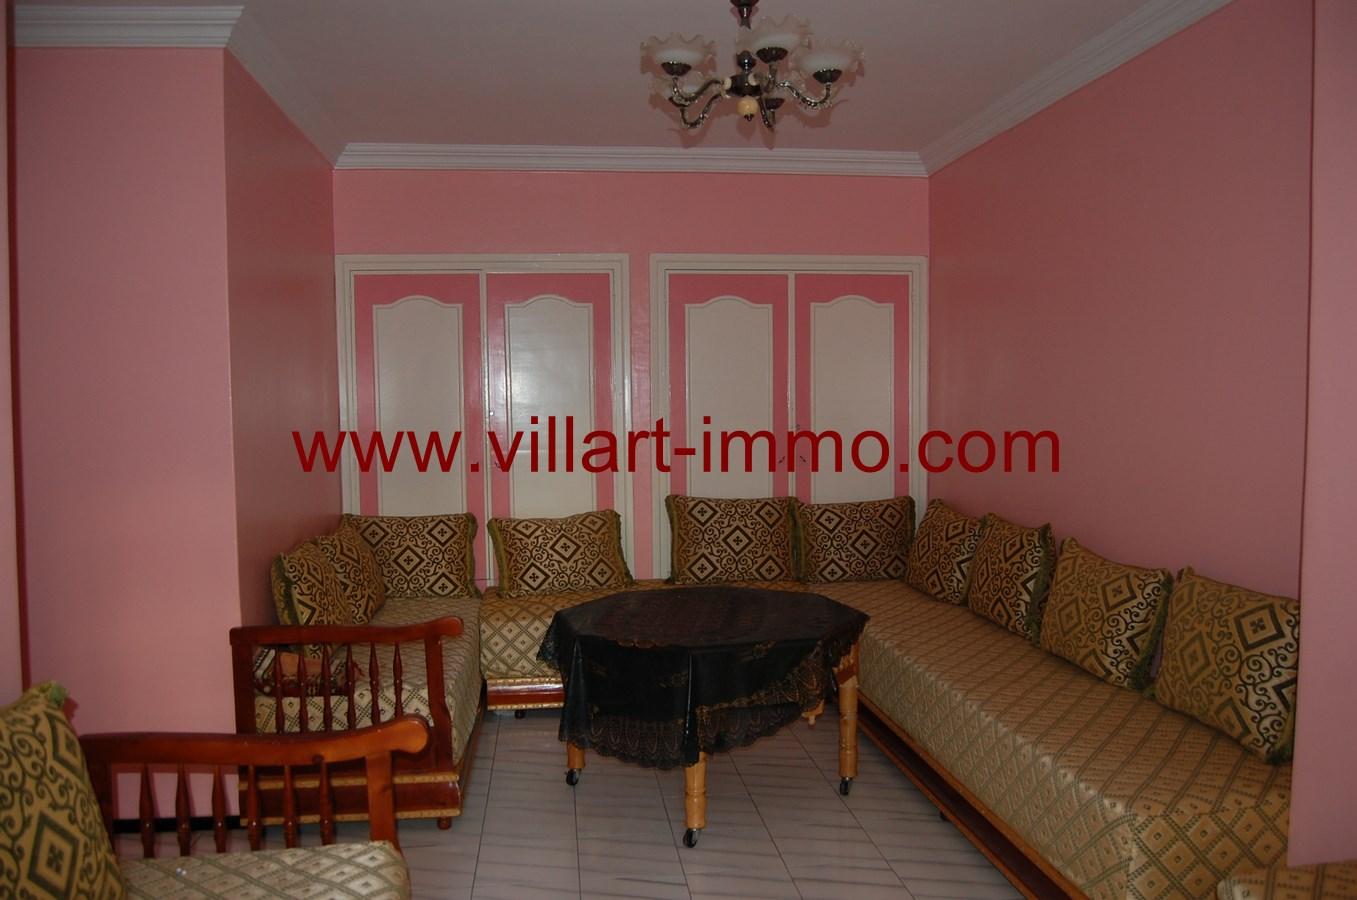 6-vente-appartement-tanger-centre-ville-chambre-4-va457-villart-immo